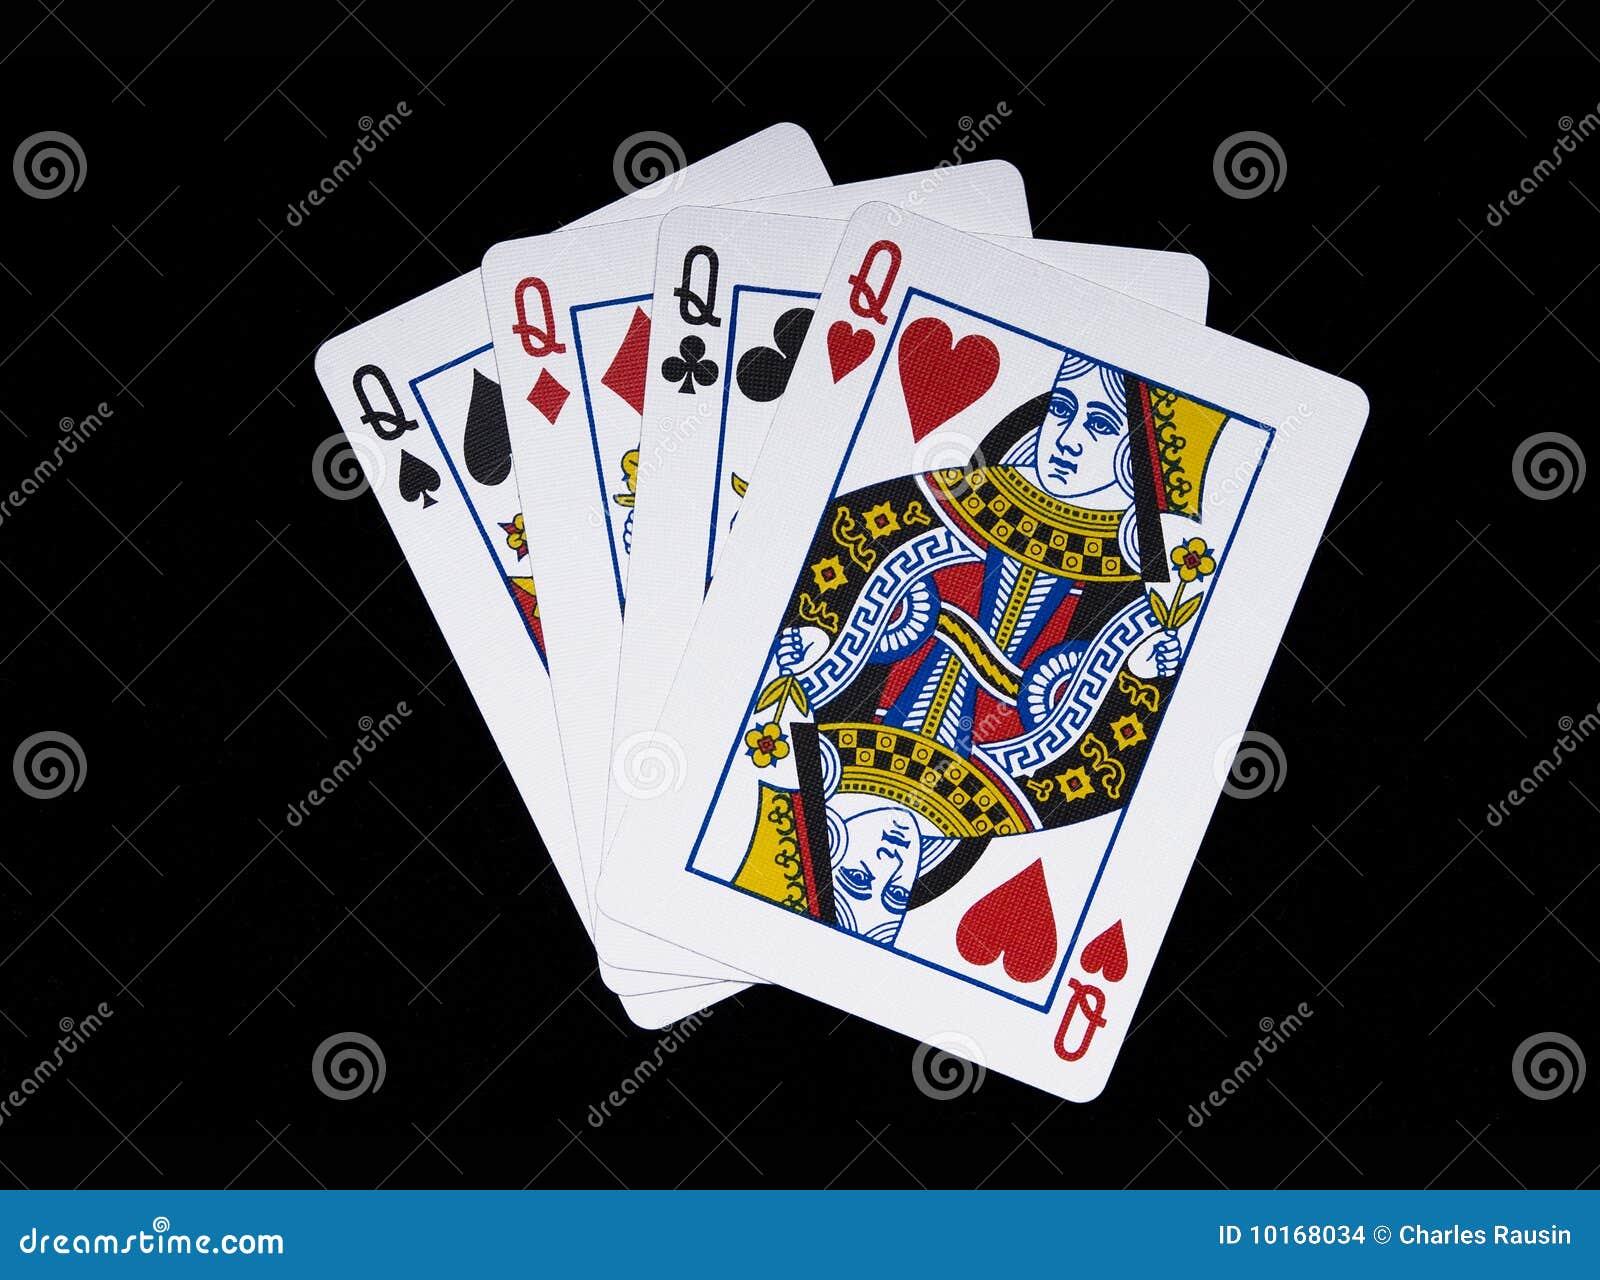 100 play video poker